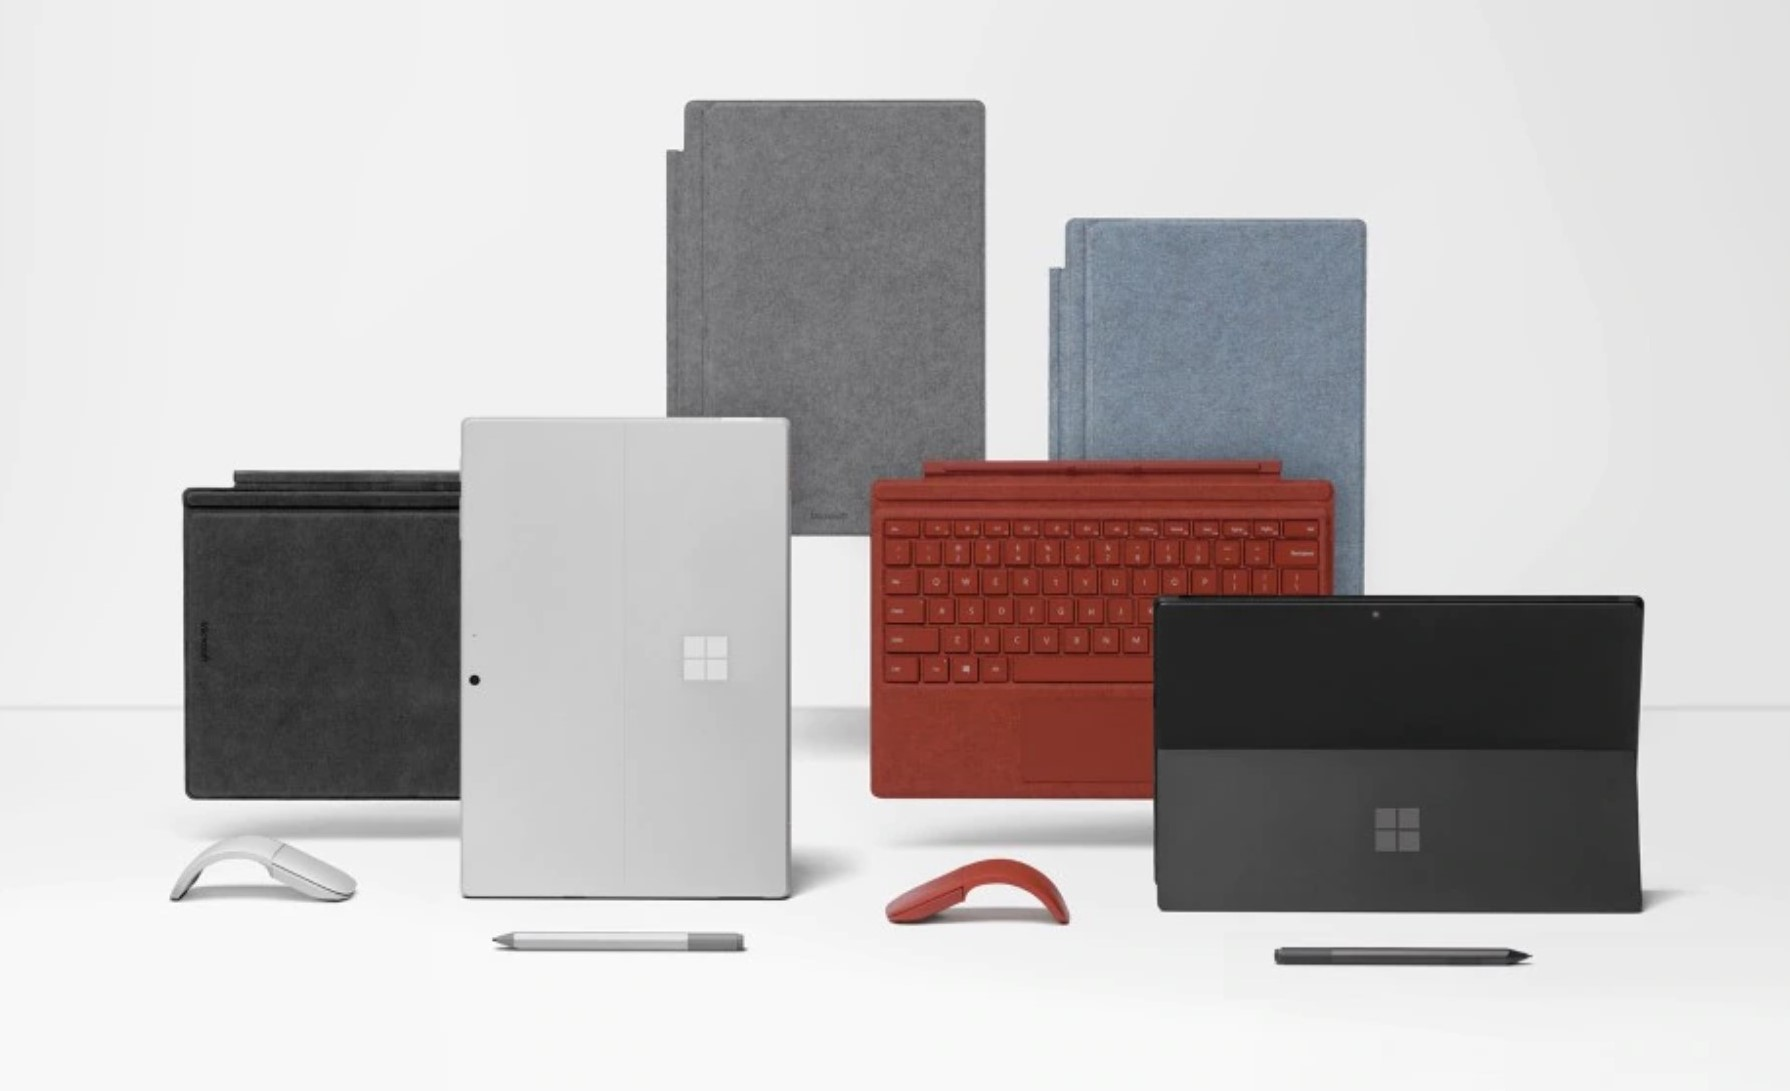 Microsoft Surface Pro 7 i Surface Laptop 3 - oto ceny w Polsce 21